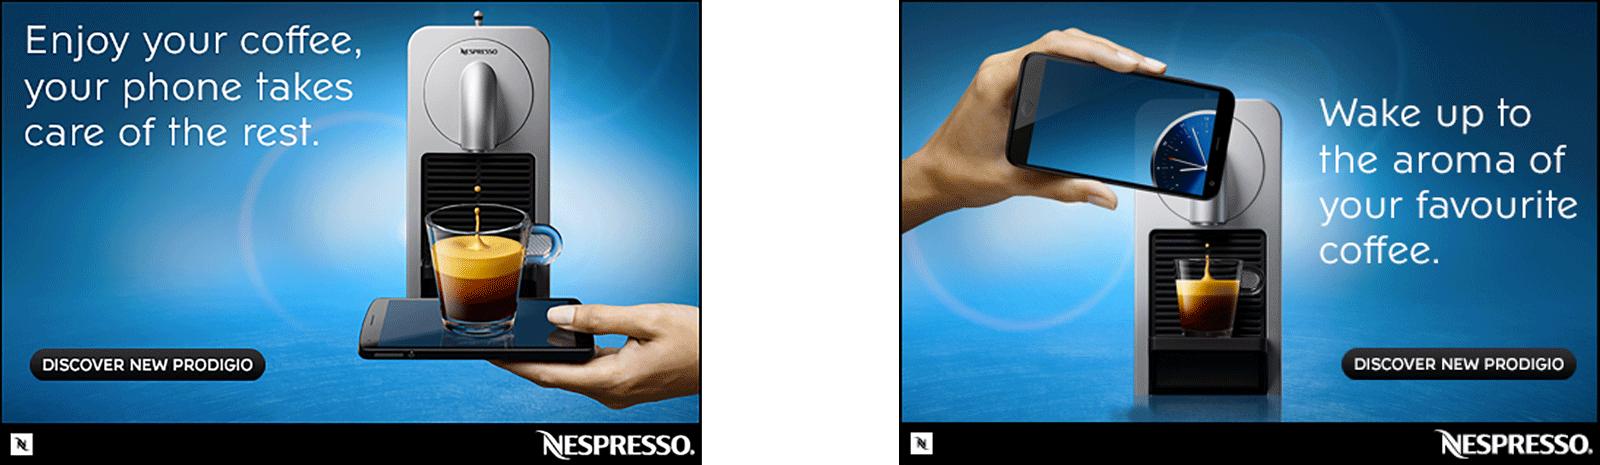 Squids Network Nespresso Machine Prodigio Banners